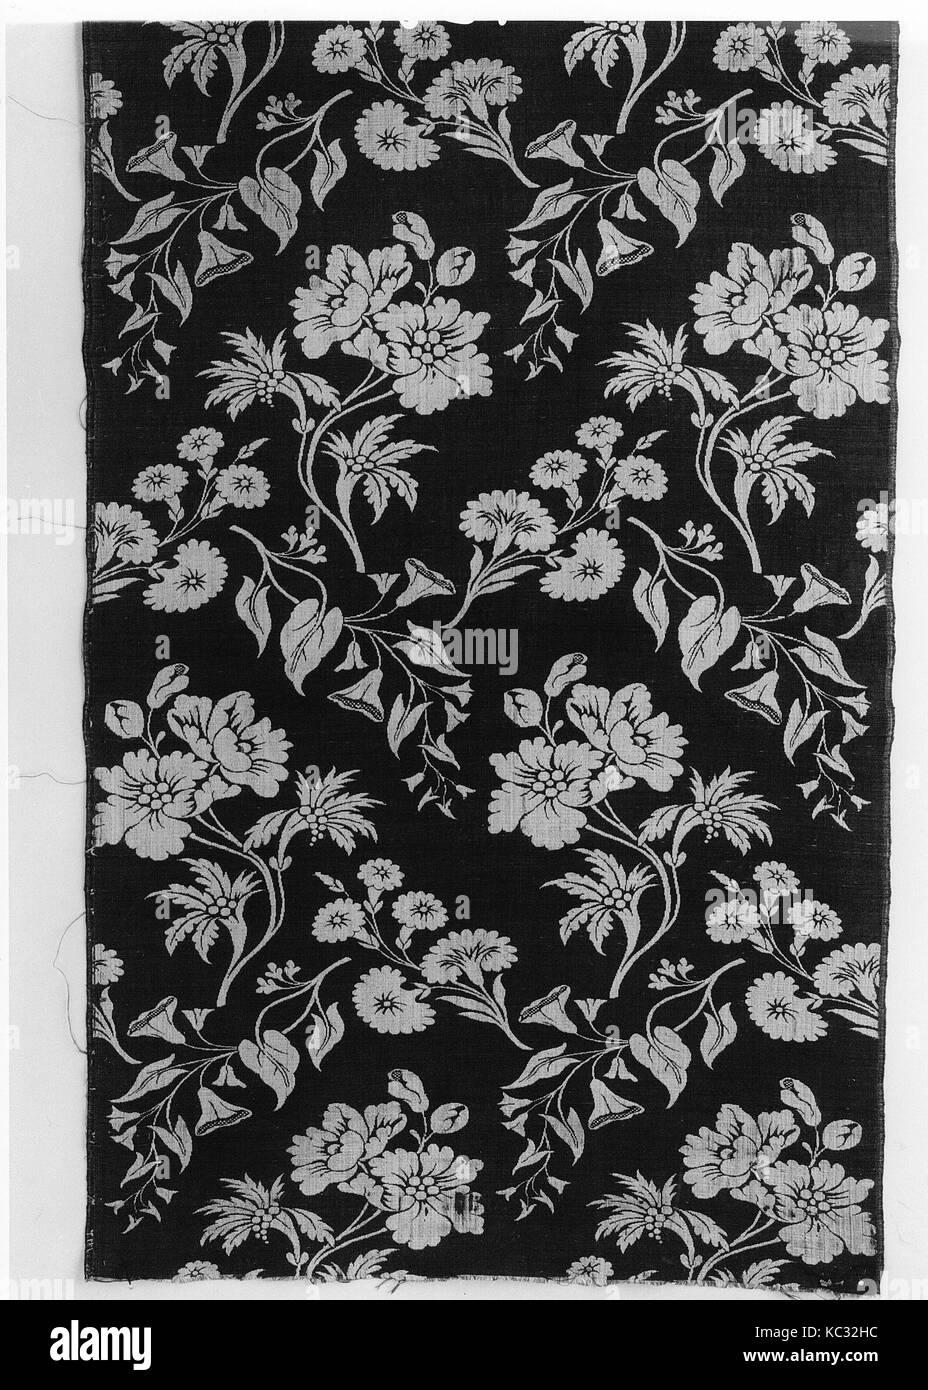 Länge, Ca. 1730 s - 40 s, British, Spitalfields, Seide, H. 41 1/2x W. 18 3/4 Zoll (105,4 x 47,6 cm), Textiles Stockbild